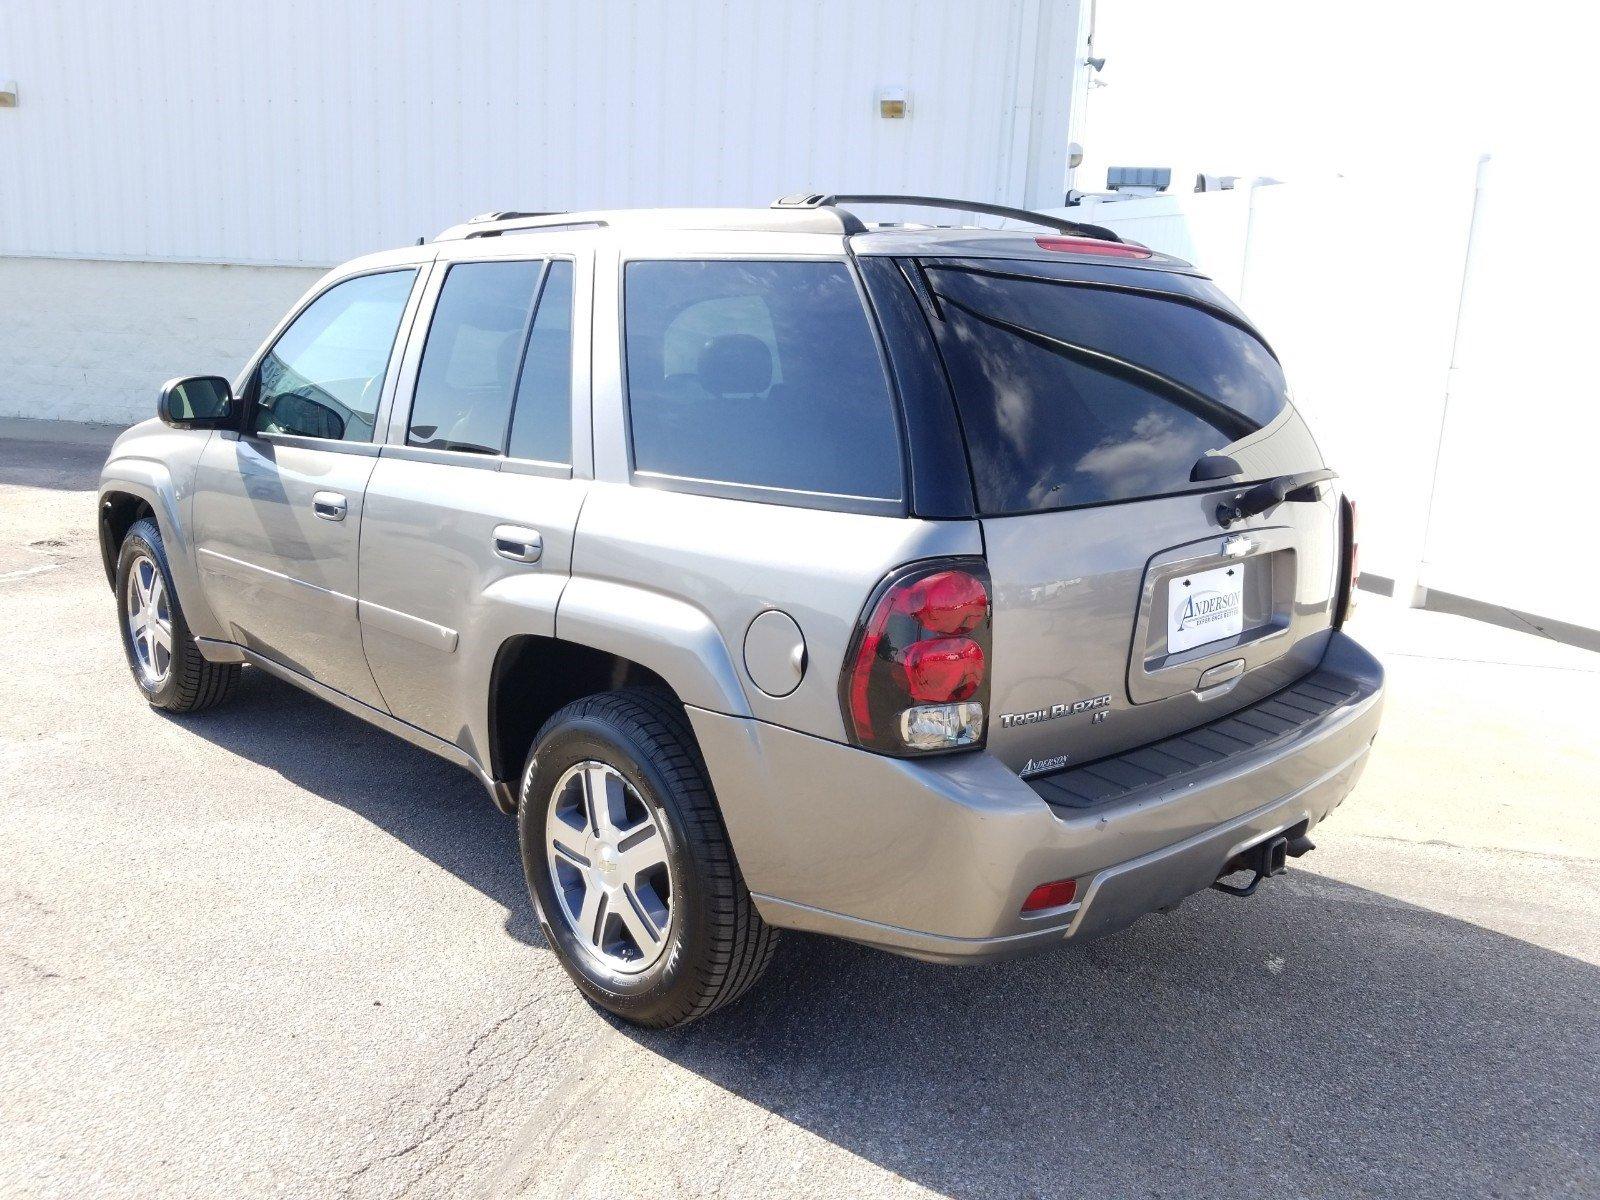 Used 2007 Chevrolet TrailBlazer LT Sport Utility for sale in Lincoln NE